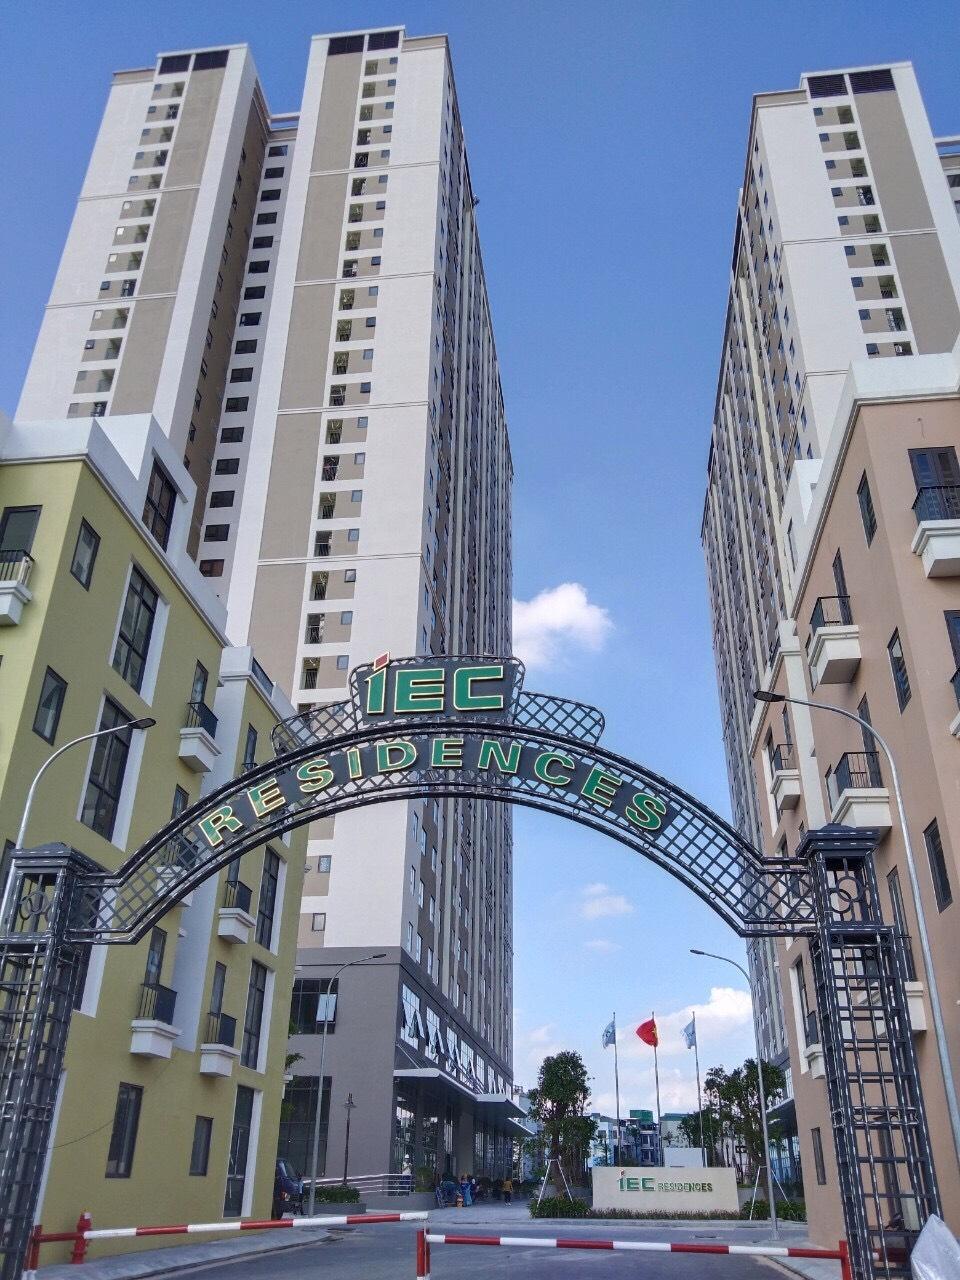 iec residences noi nuong nau chon quay ve